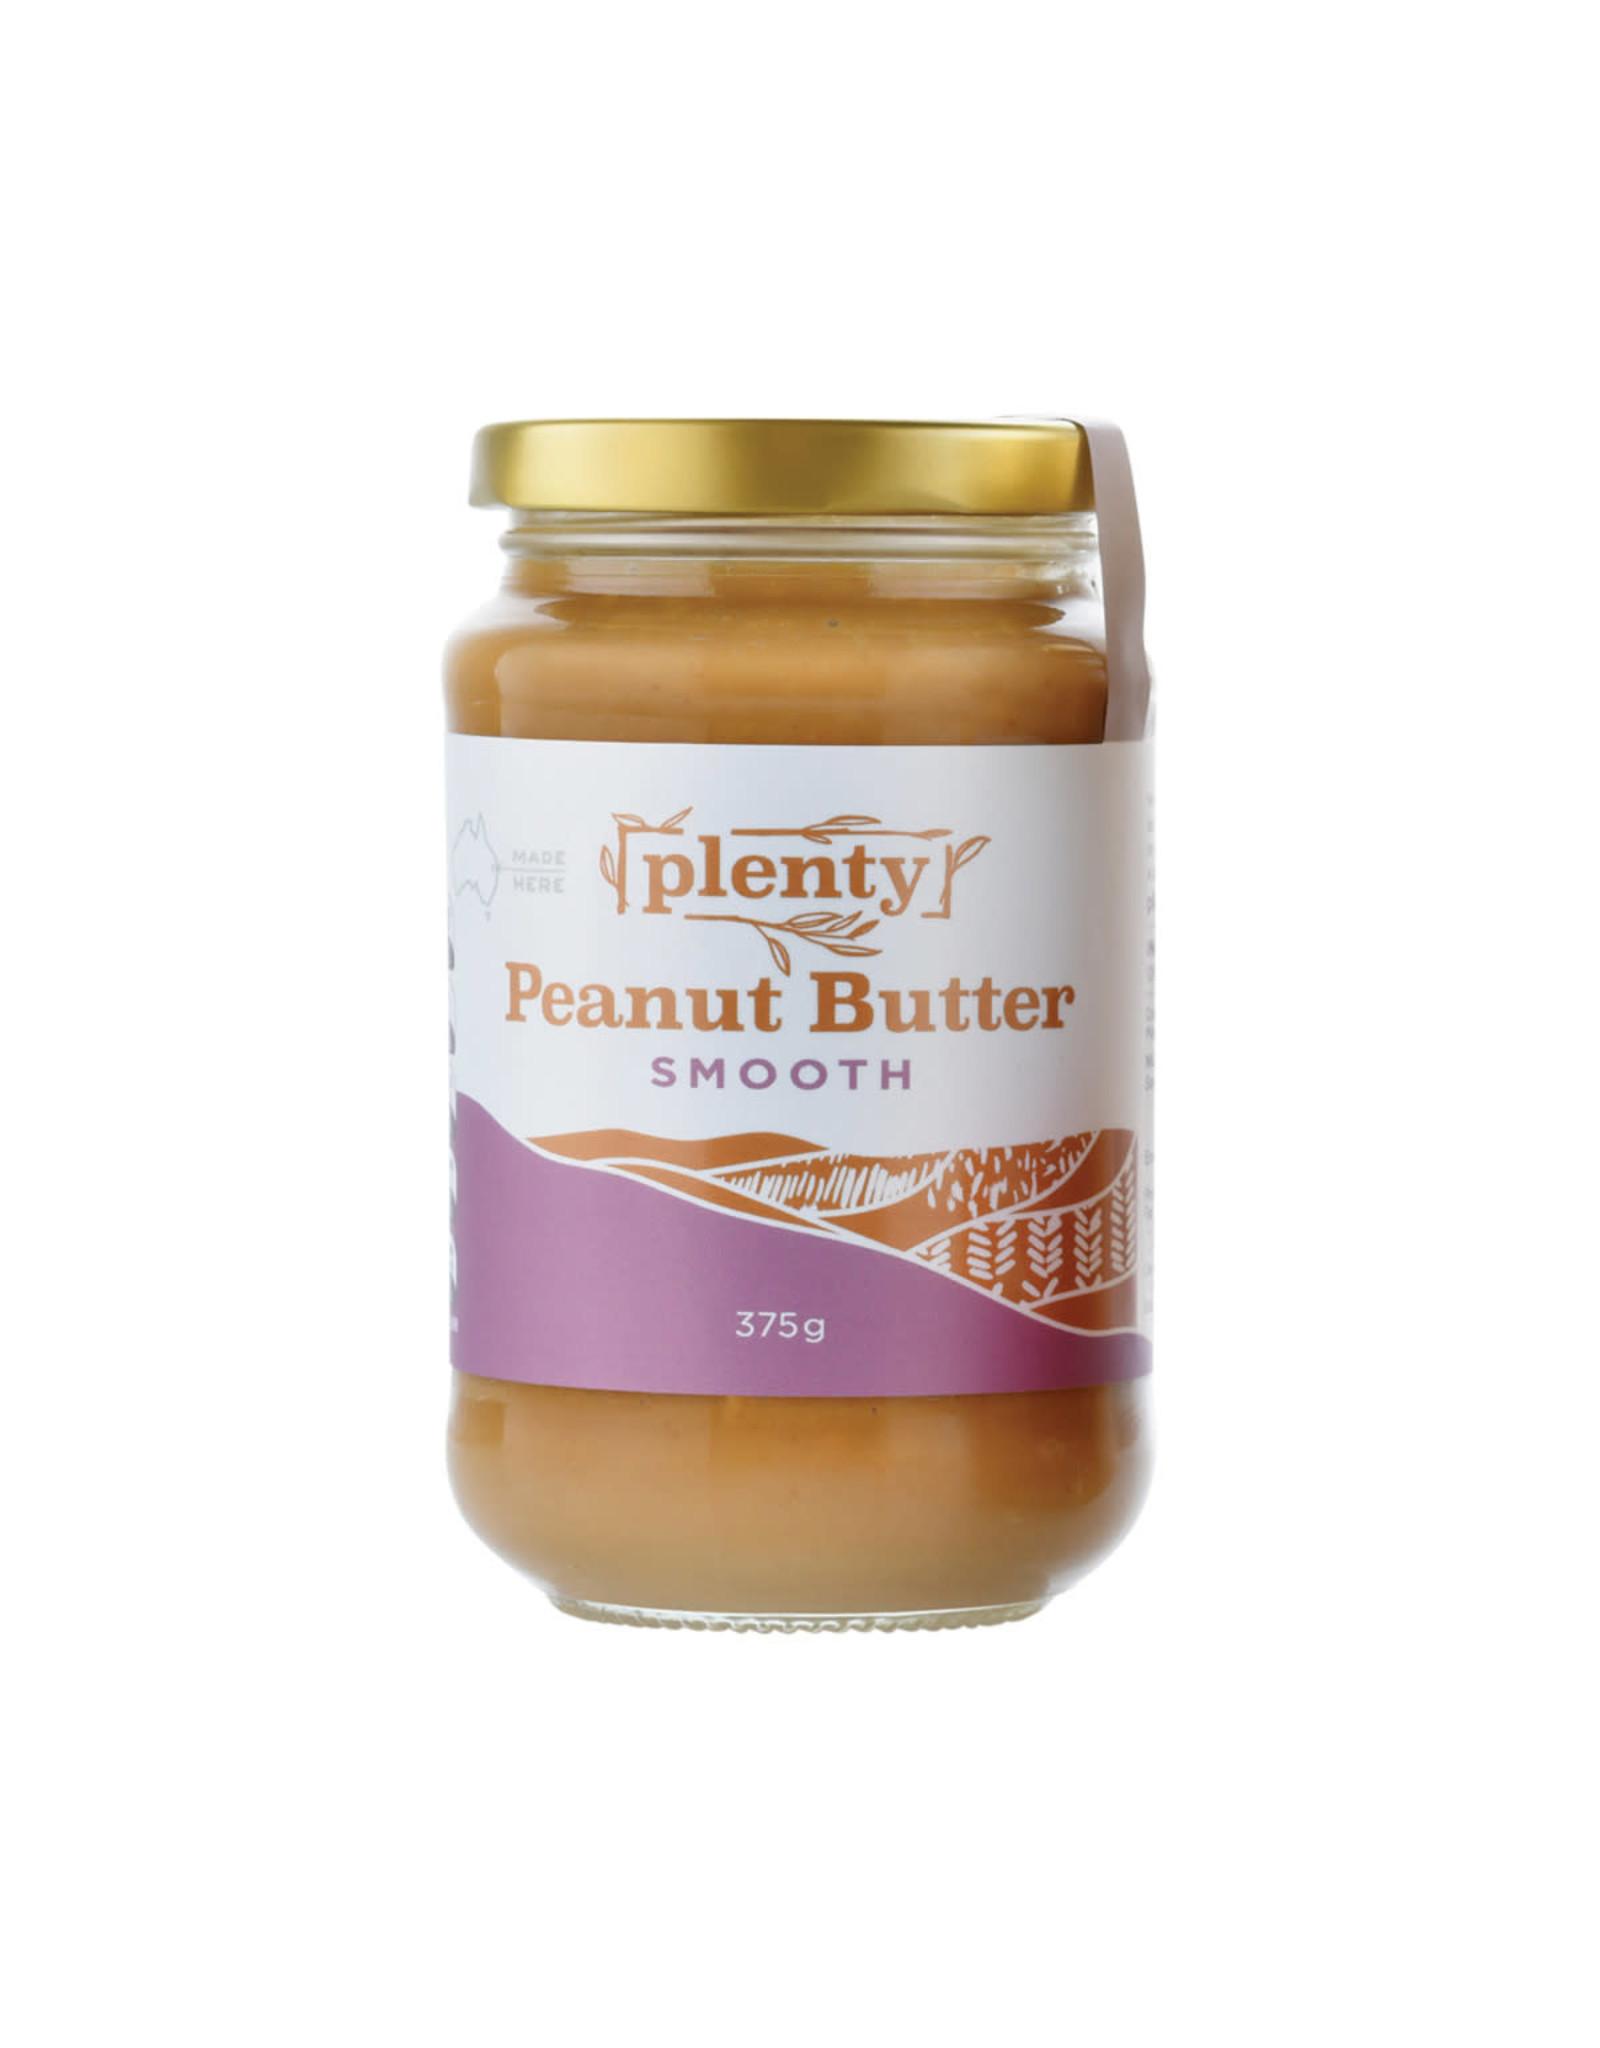 Plenty Natural Peanut Butter 375g